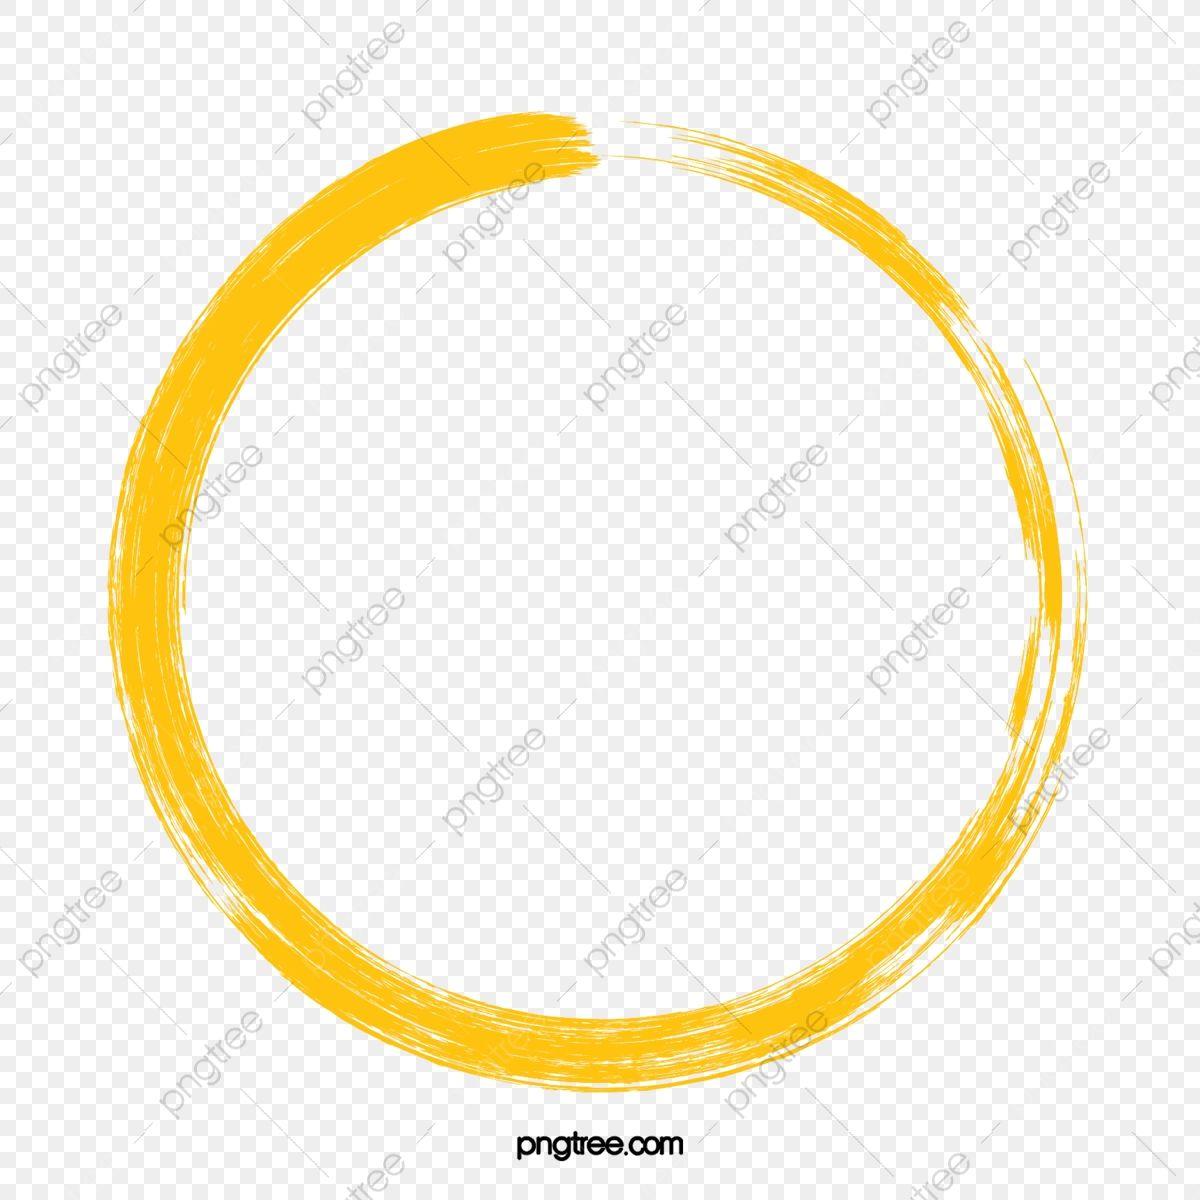 Gambar Latar Belakang Lingkaran Kuning Shading Lingkaran Clipart Kuning Lingkaran Png Transparan Clip Di 2021 Latar Belakang Kuning Gambar Latar Belakang Seni Pohon